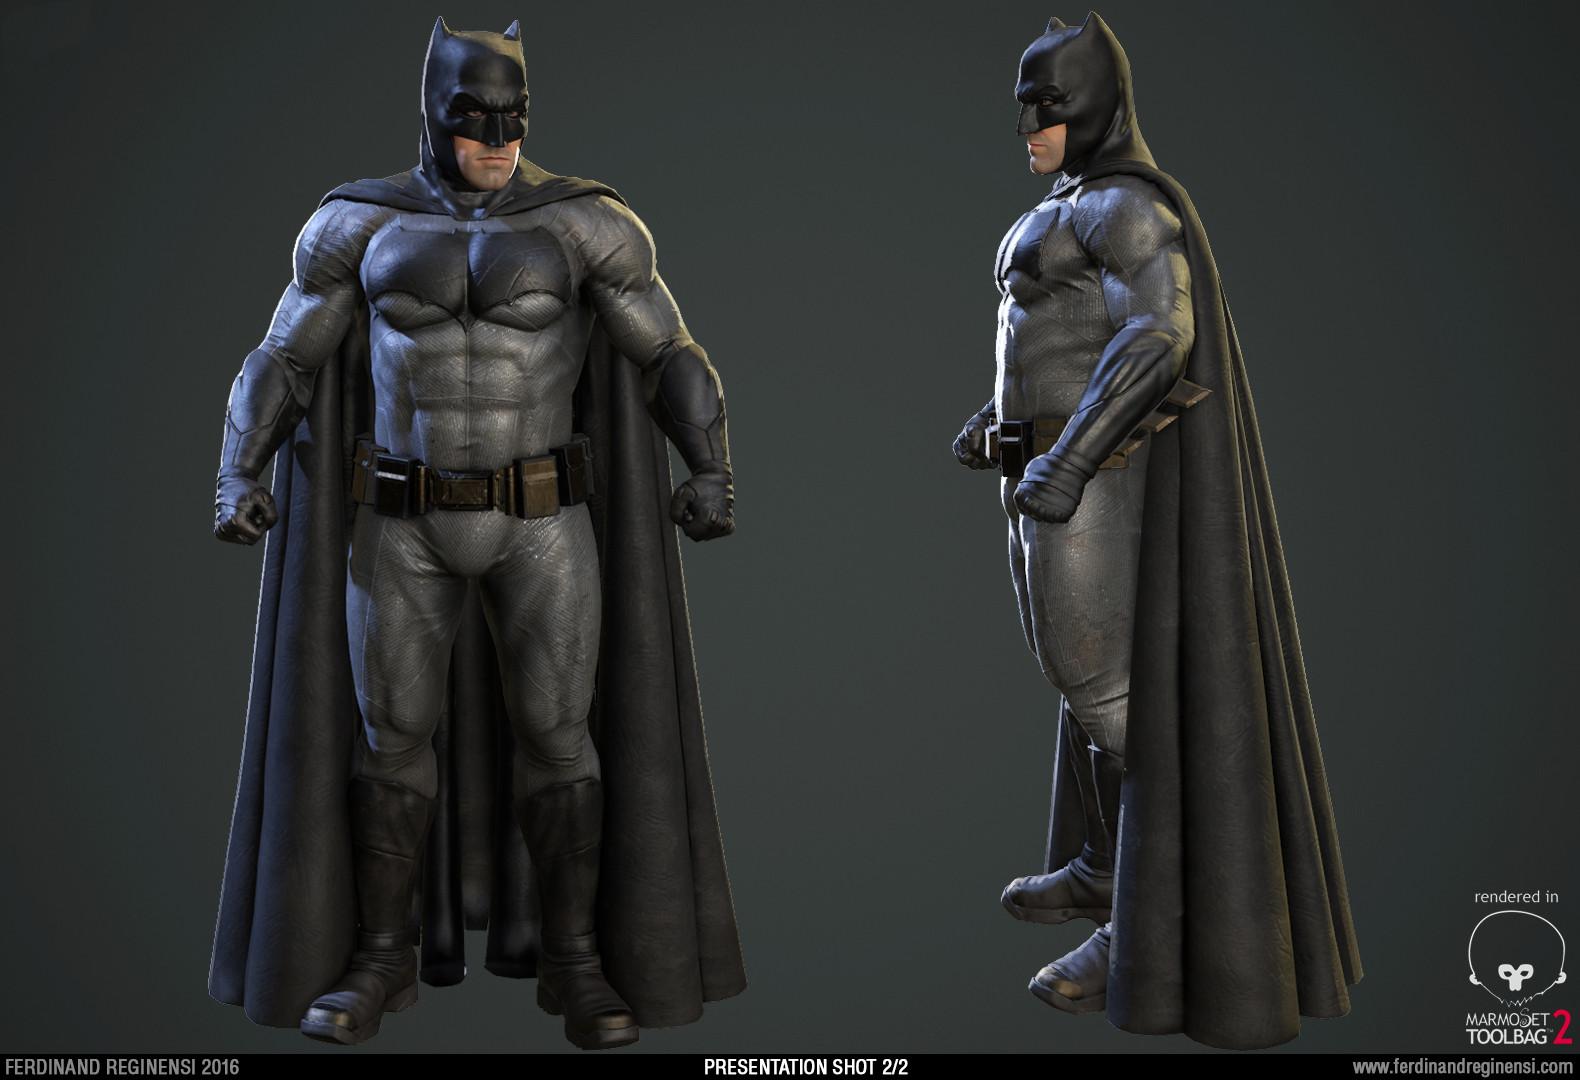 Character Design Portfolio Presentation : Ferdinand reginensi portfolio batman v superman fan art